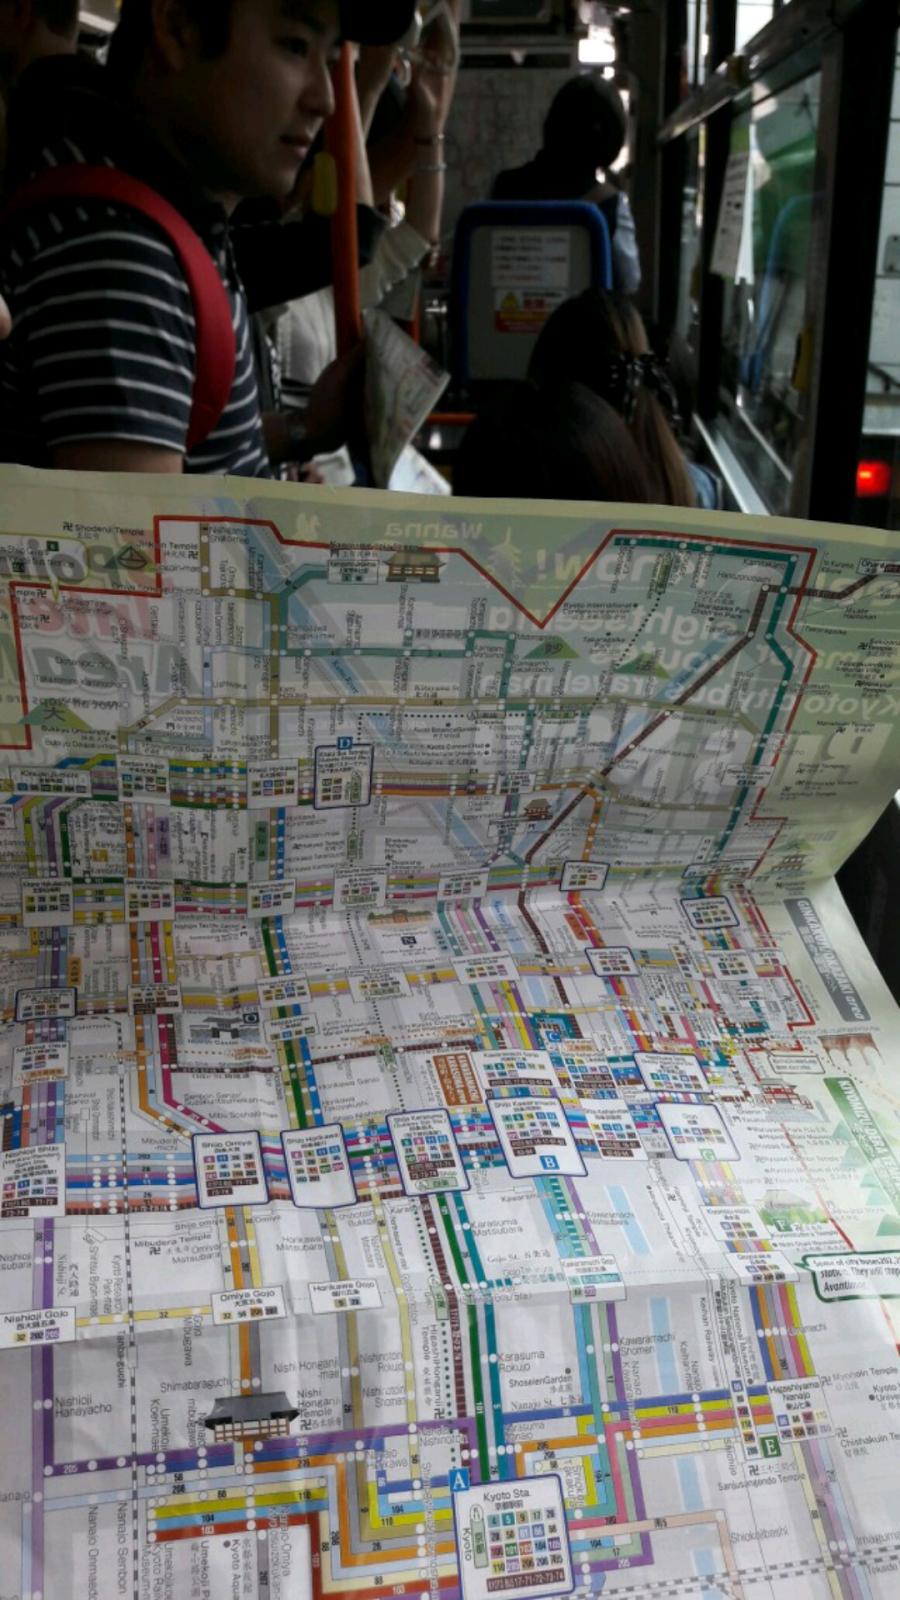 Catatan Perjalanan Transportasi Selama Di Jepang Tanpa Jr Pass Takayama Hokuriku 5 Days Jrpass Dewasa Route Bus Map Yg Gak Kalah Bikin Pusing